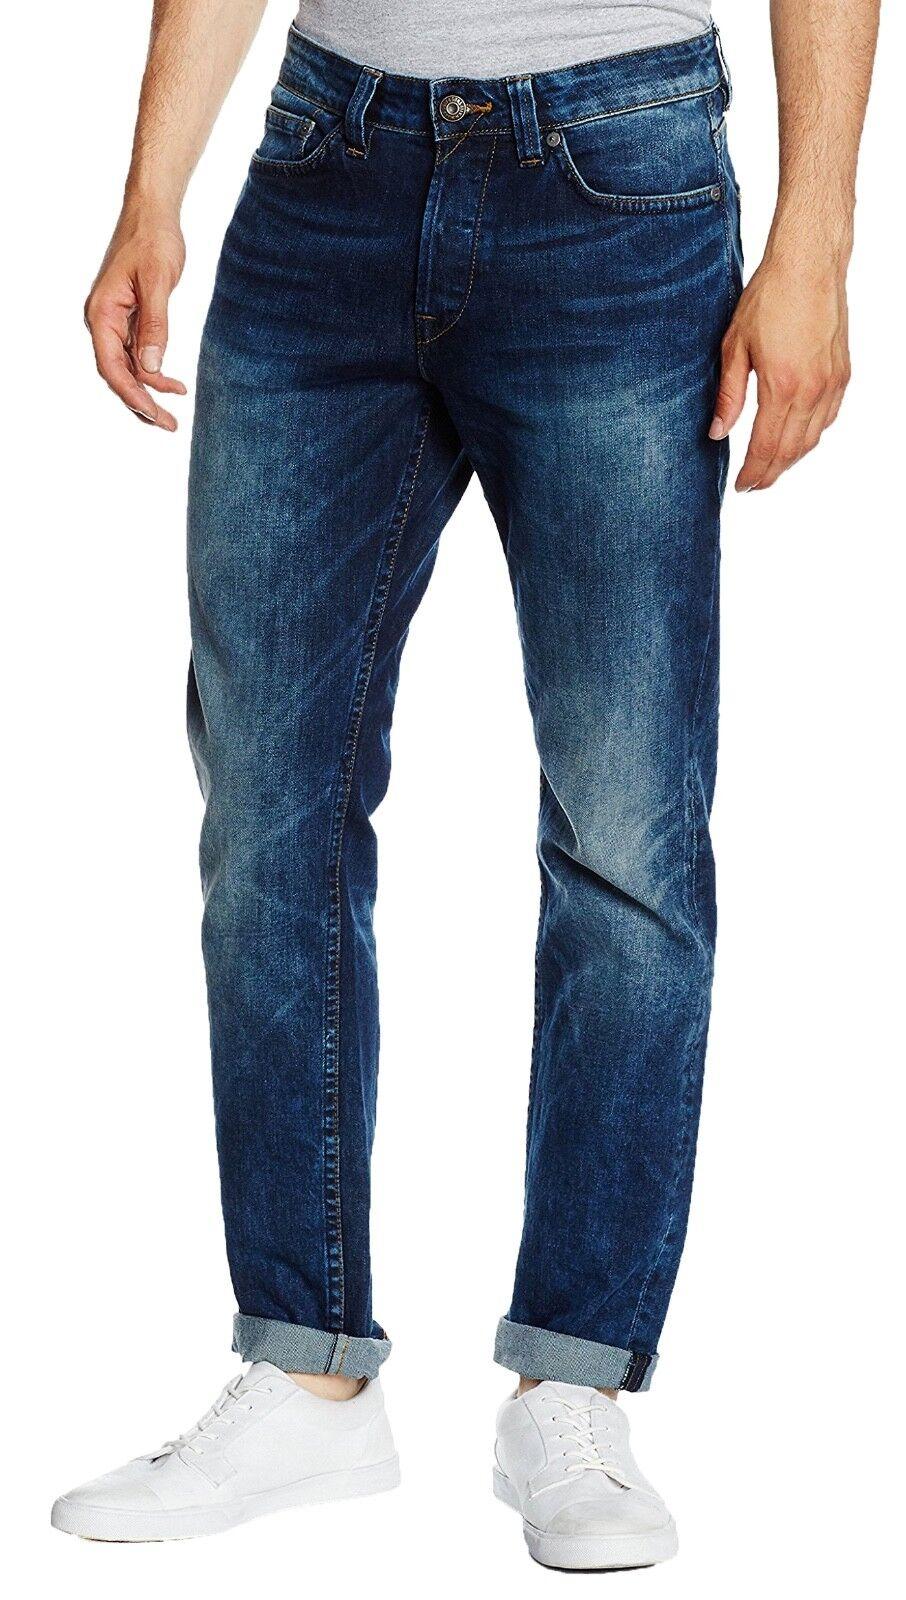 SONS Jeans Mens Weft Regular Fit Vintage Stretch Denim Pants Faded bluee